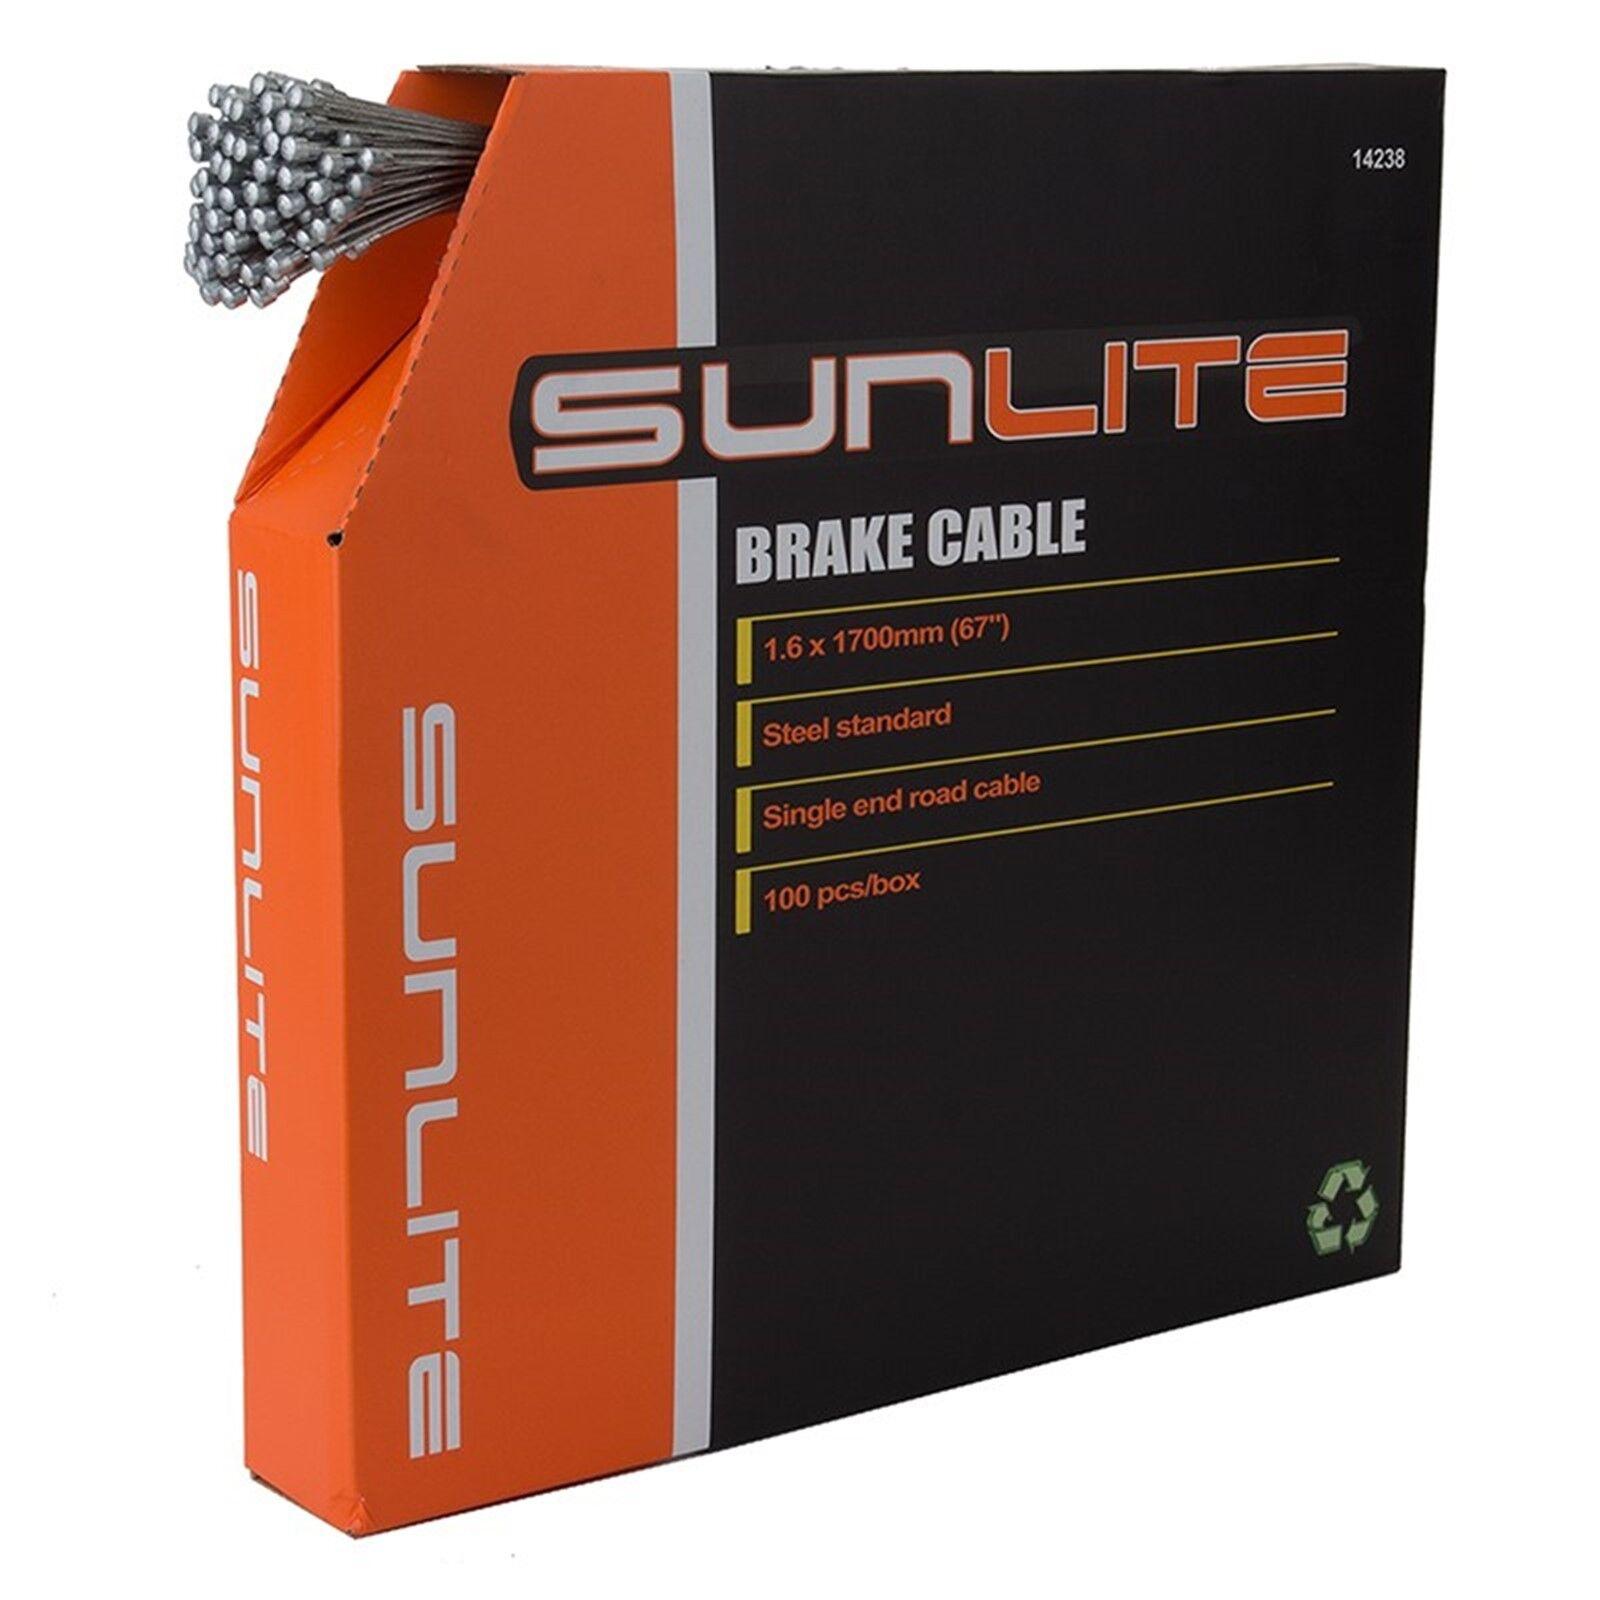 Sunlite cables de cables de freno - 1700 Mm  - 1.6 Mm-galv-Plateado - 100 Bx - Road  excelentes precios